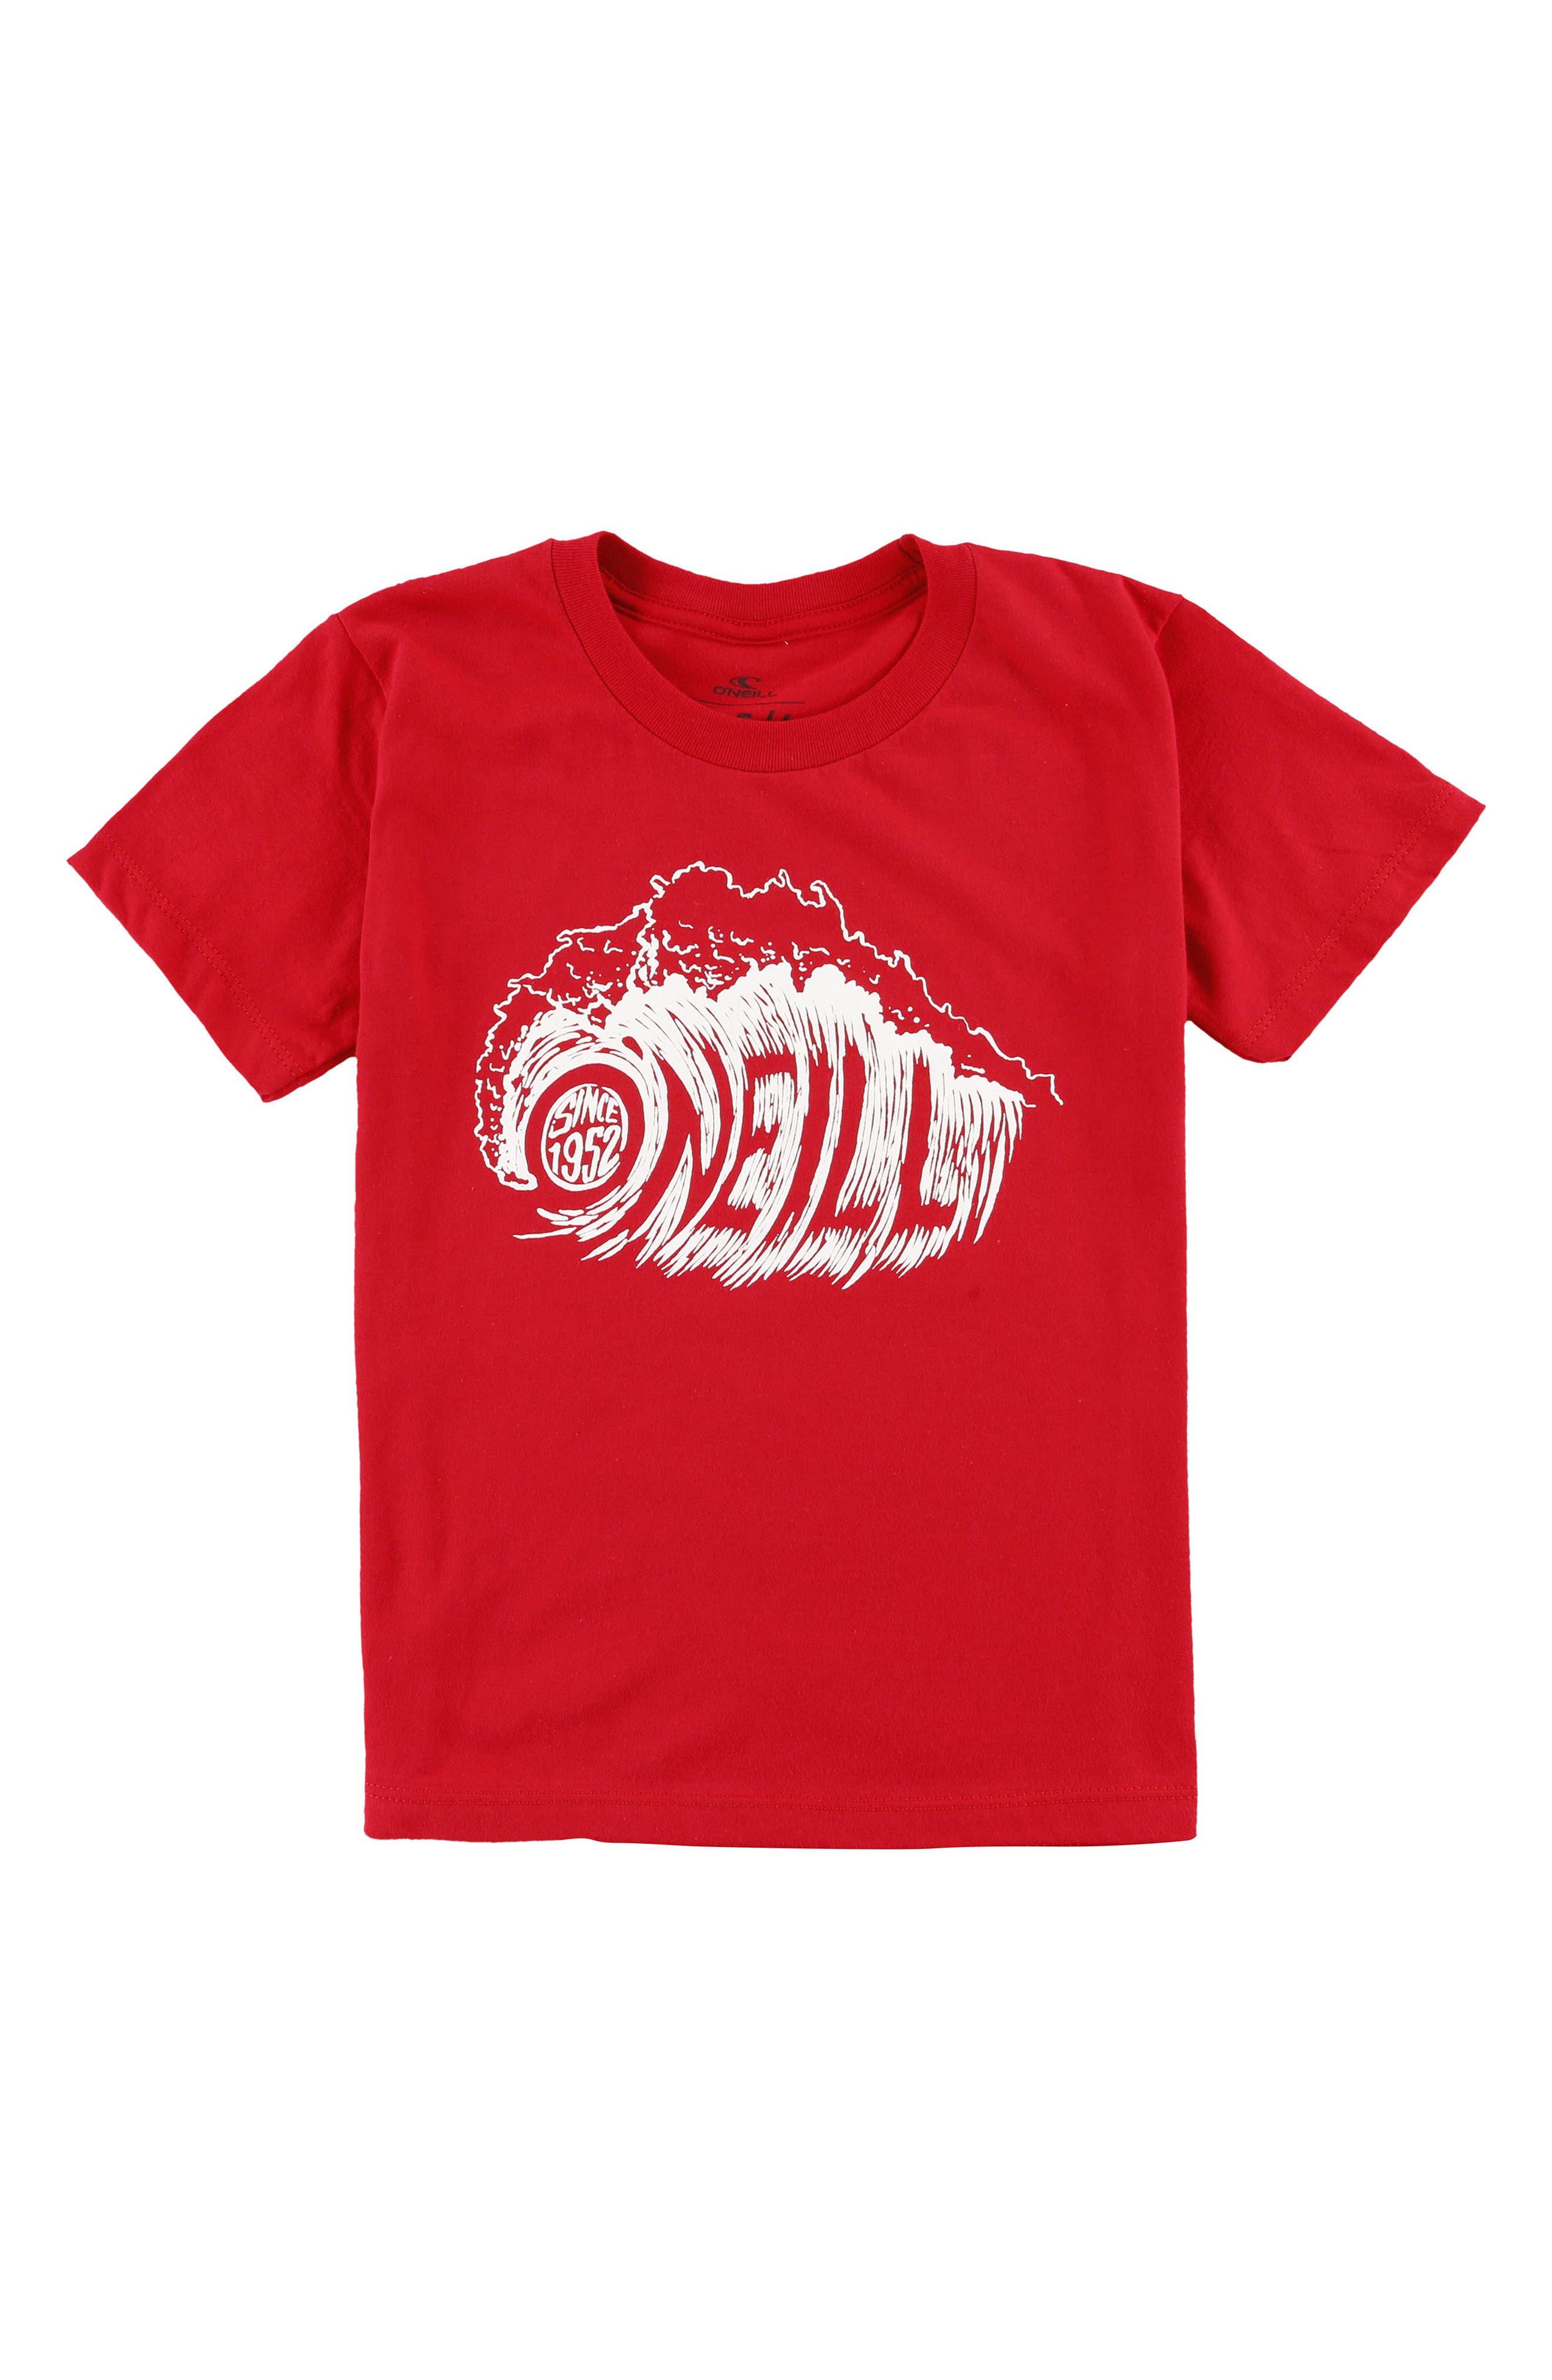 O'Neill Sandspit Graphic T-Shirt (Toddler Boys)